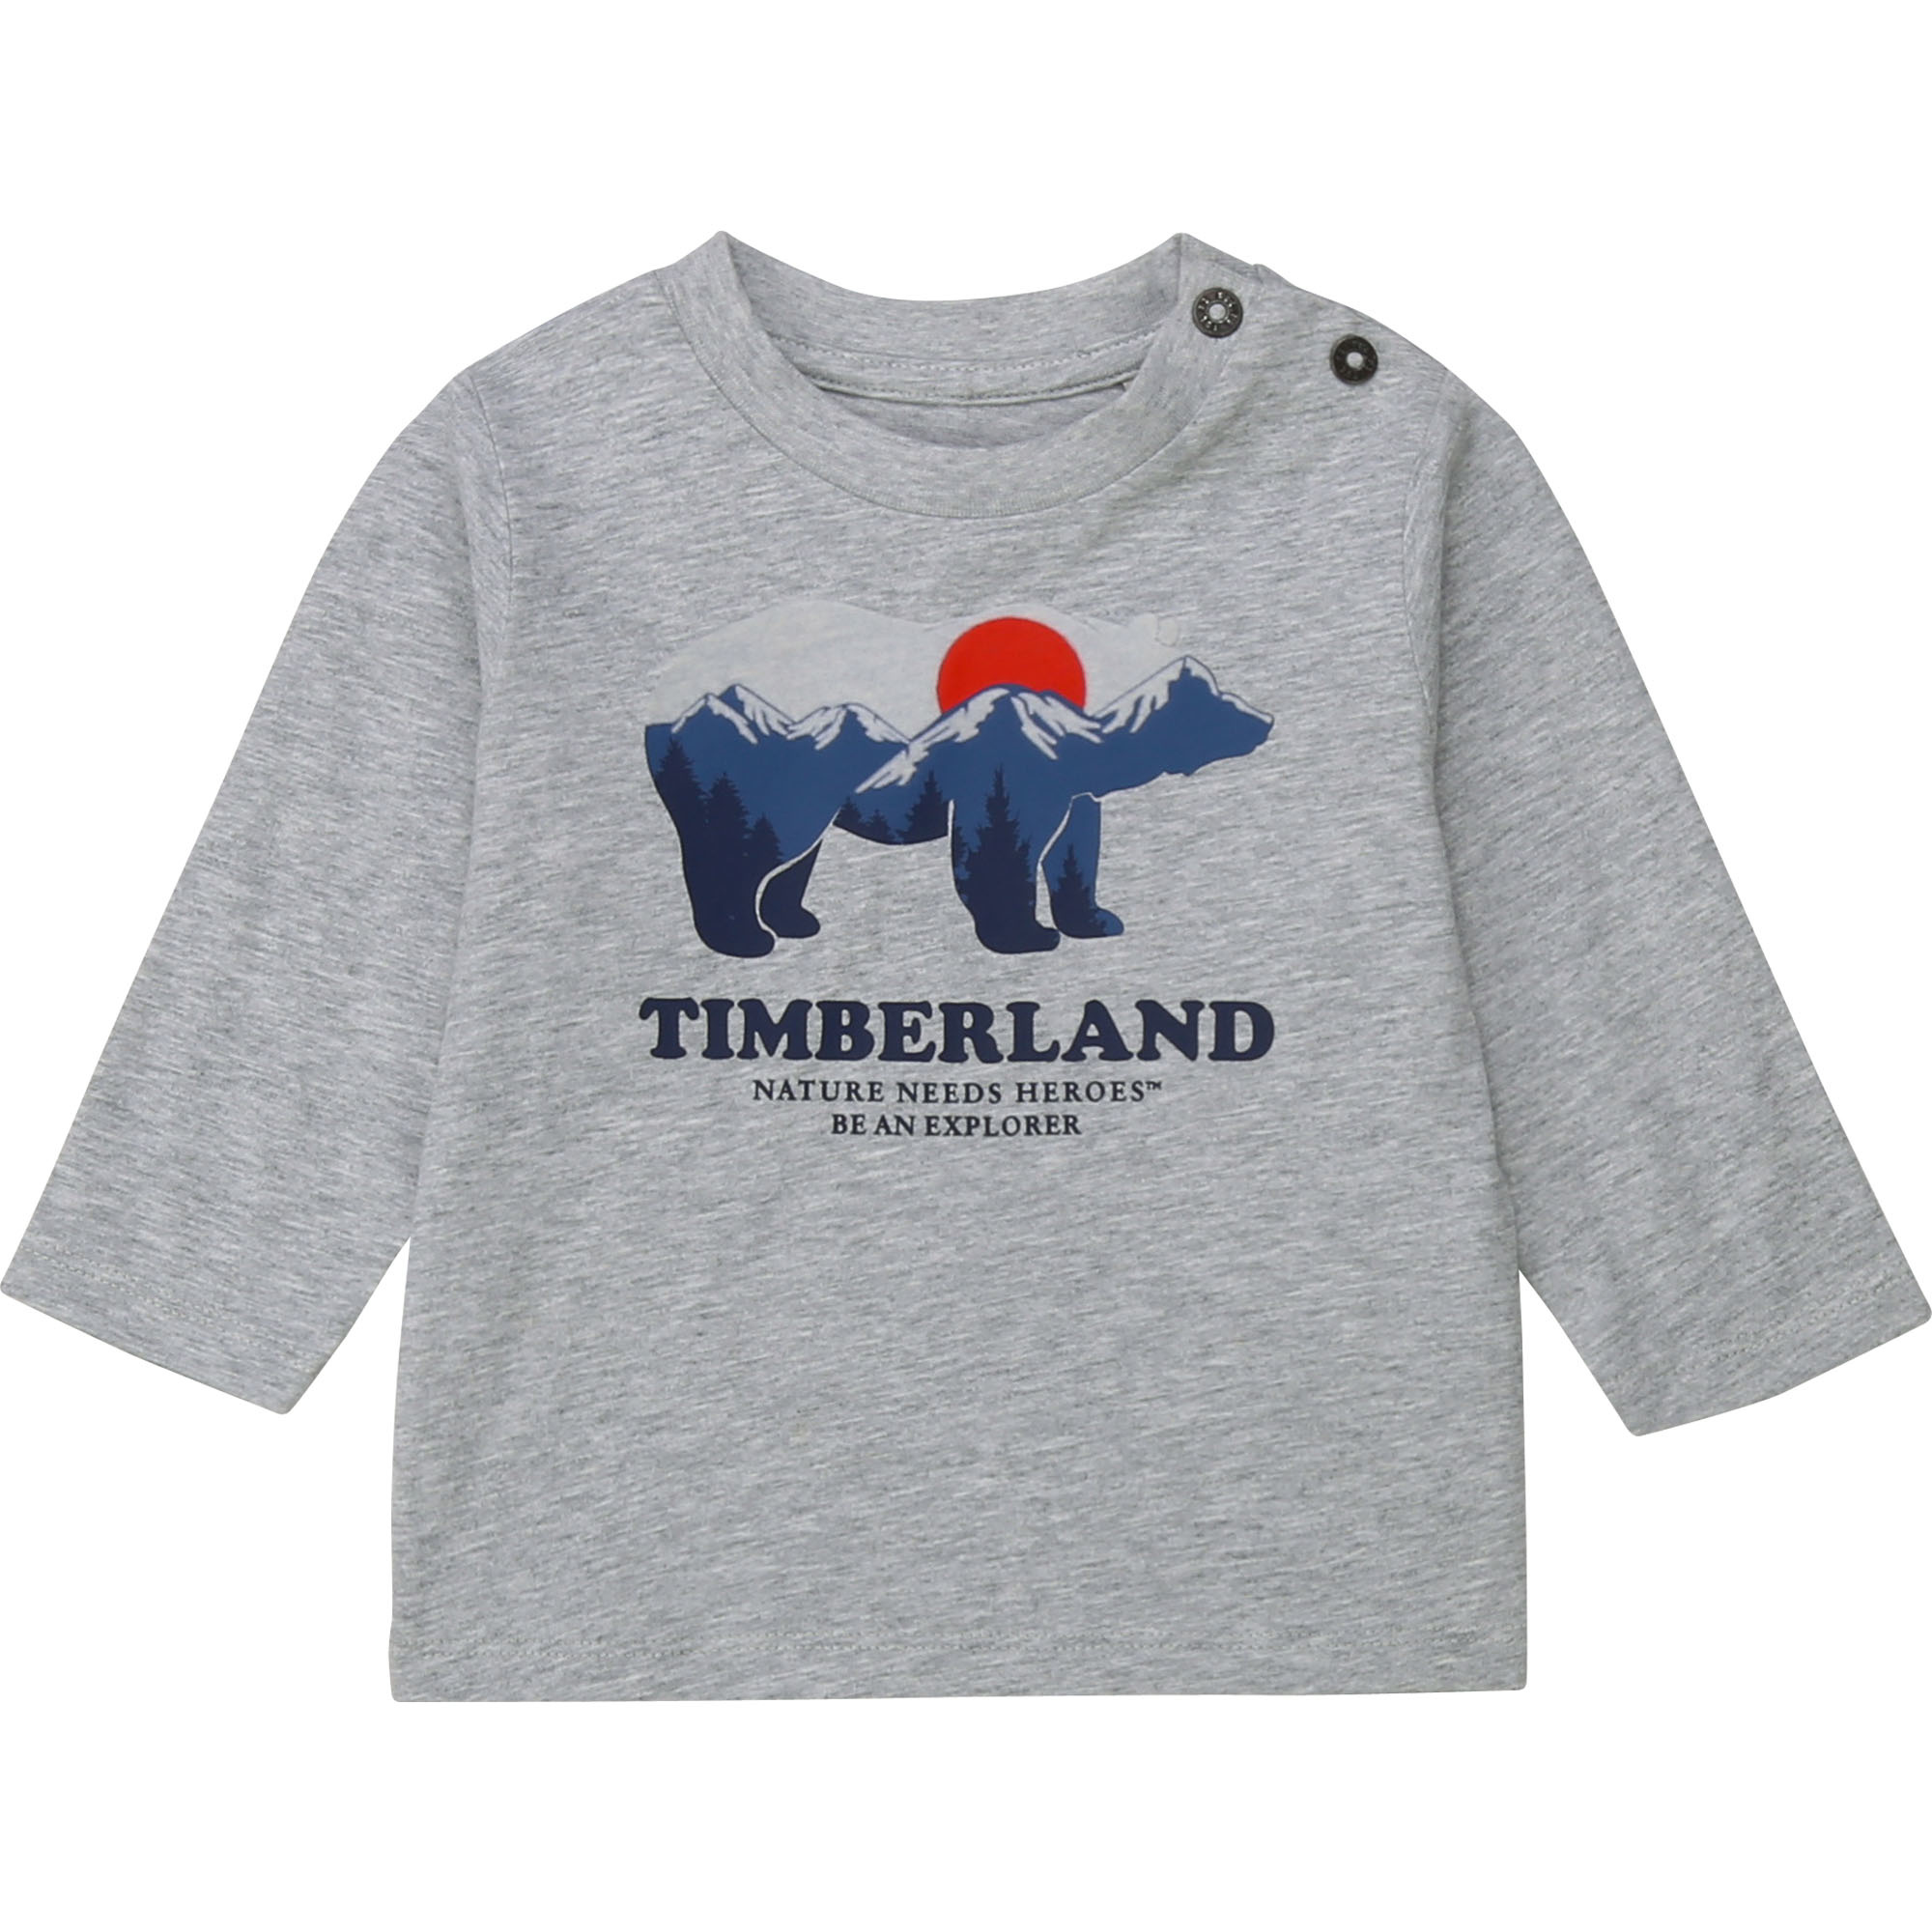 TIMBERLAND t-shirt jersey manches longues-3